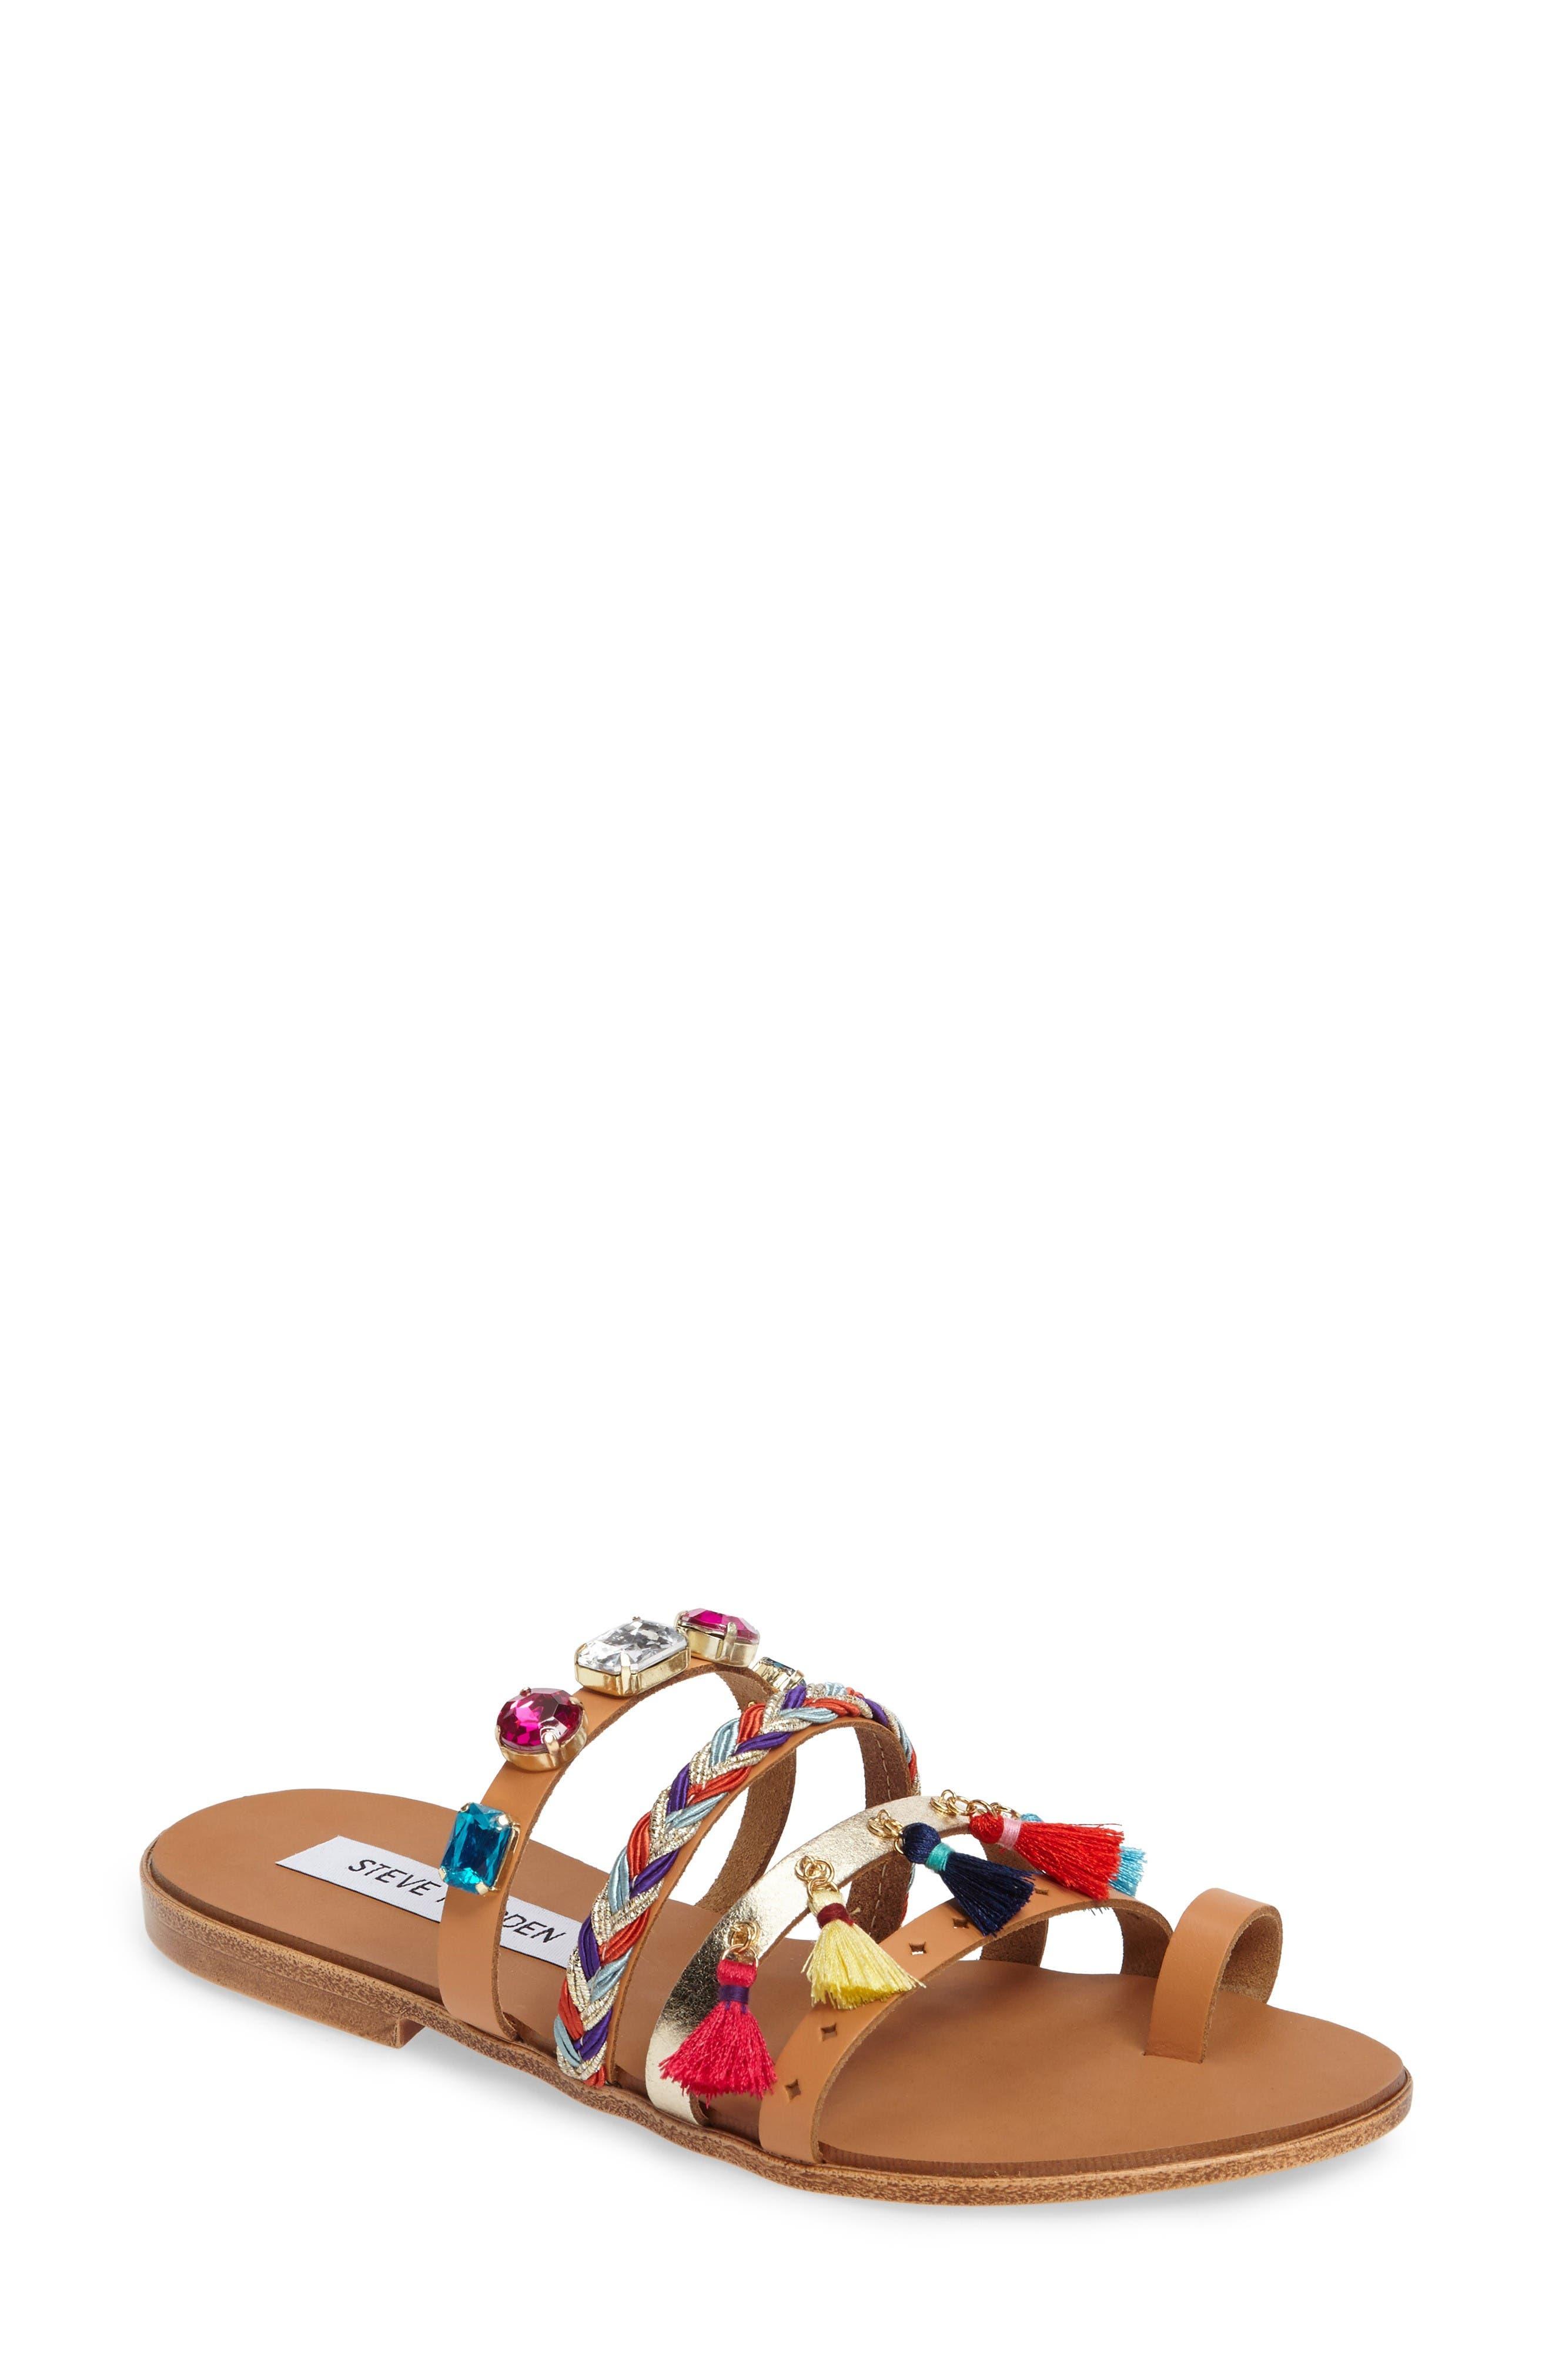 Alternate Image 1 Selected - Steve Madden Cary Embellished Sandal (Women)